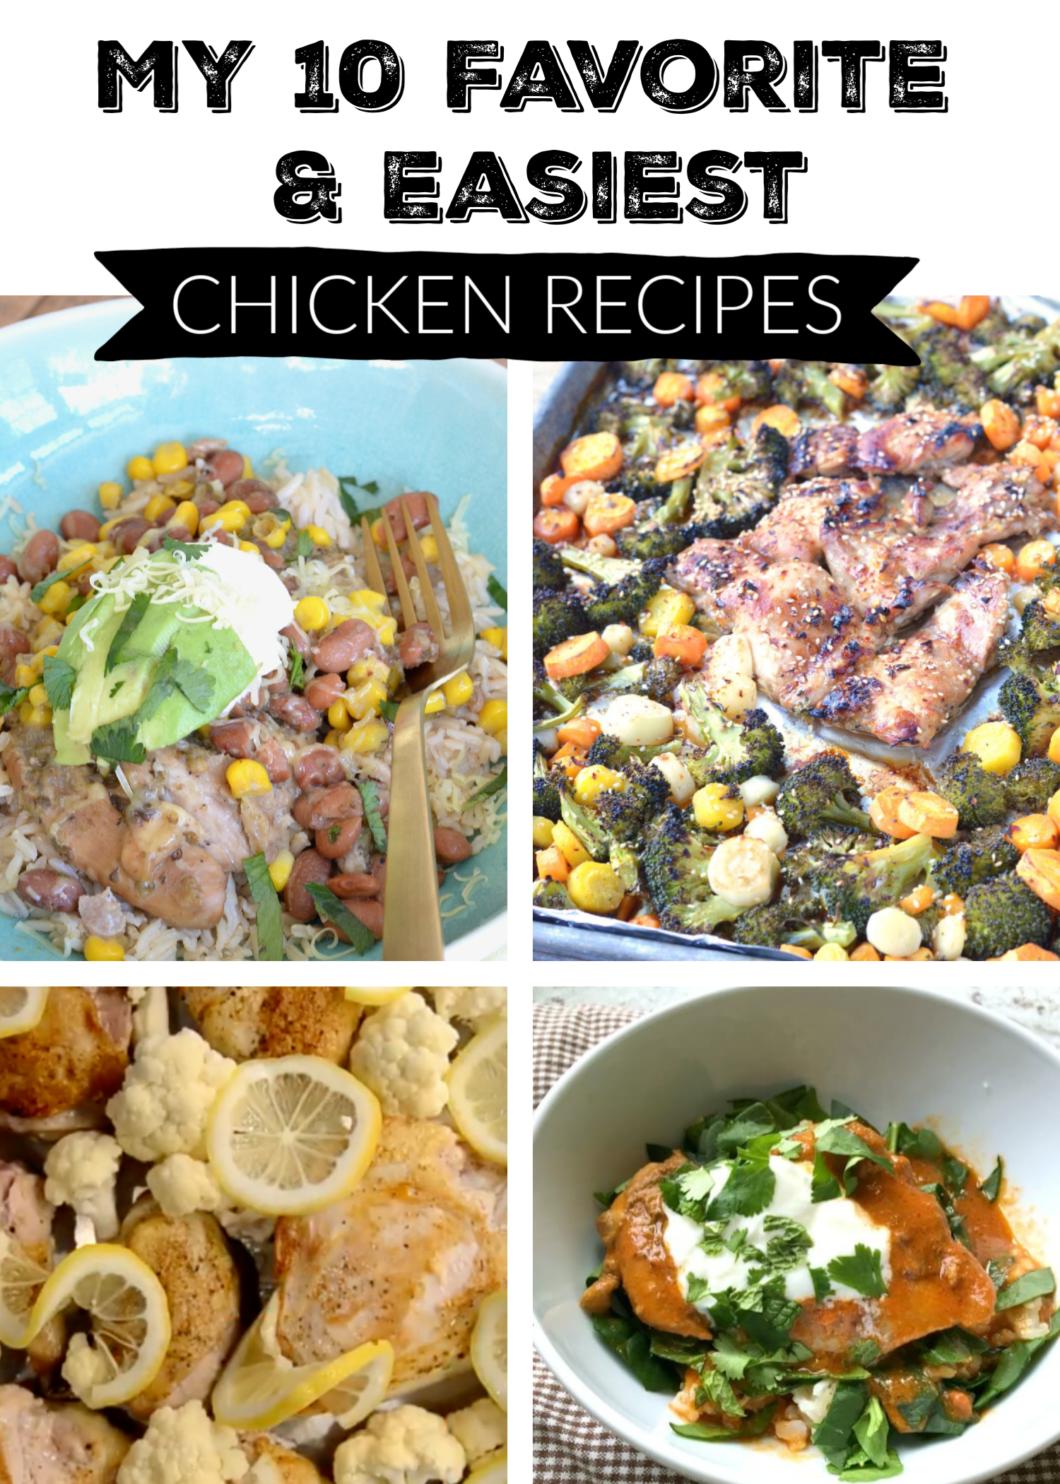 10 favorite chicken recipes